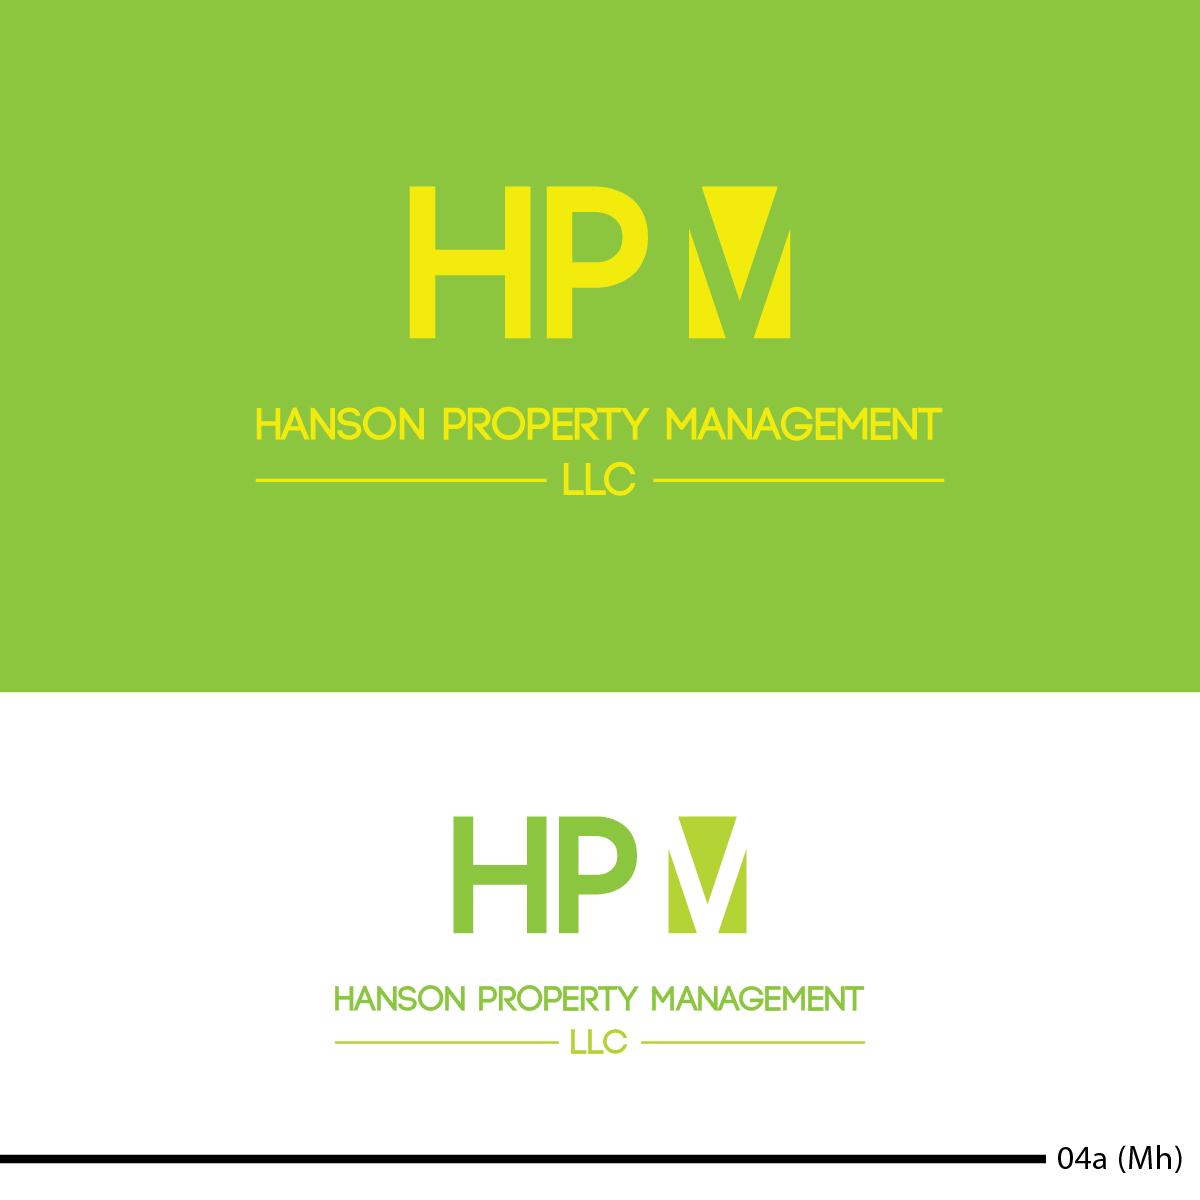 Hanson Property Management Llc